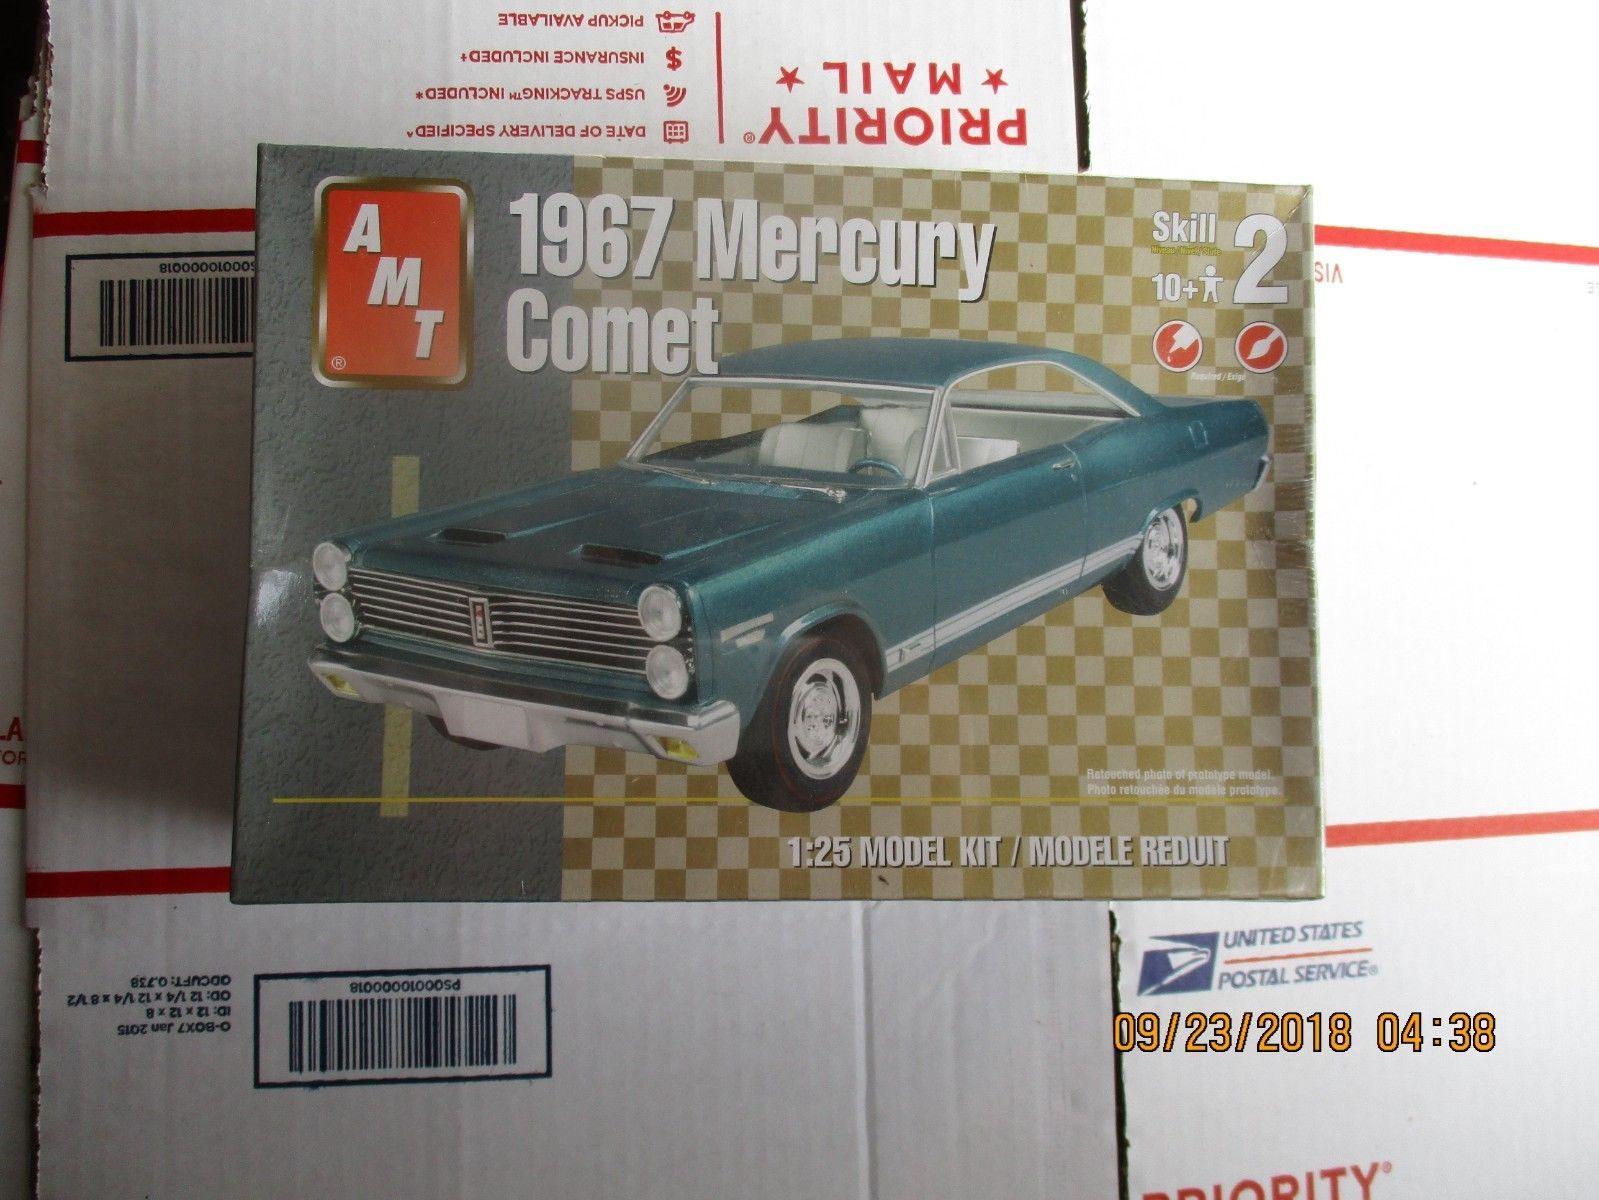 AMT 1967 Mercury Comet 1/25 scale